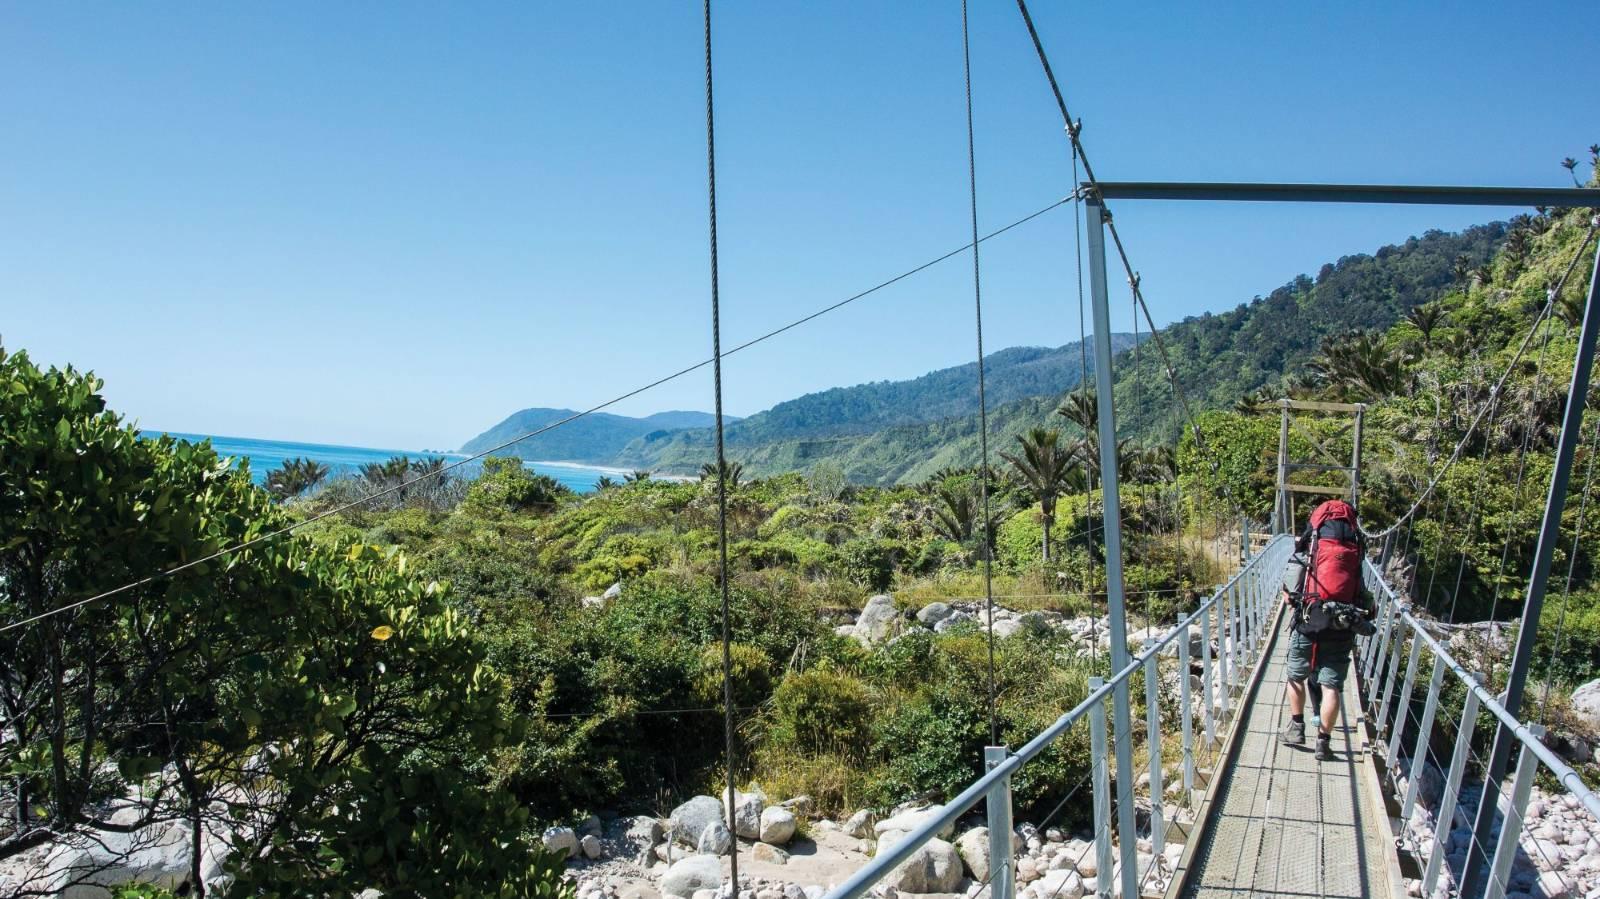 A guide to visiting Kahurangi National Park